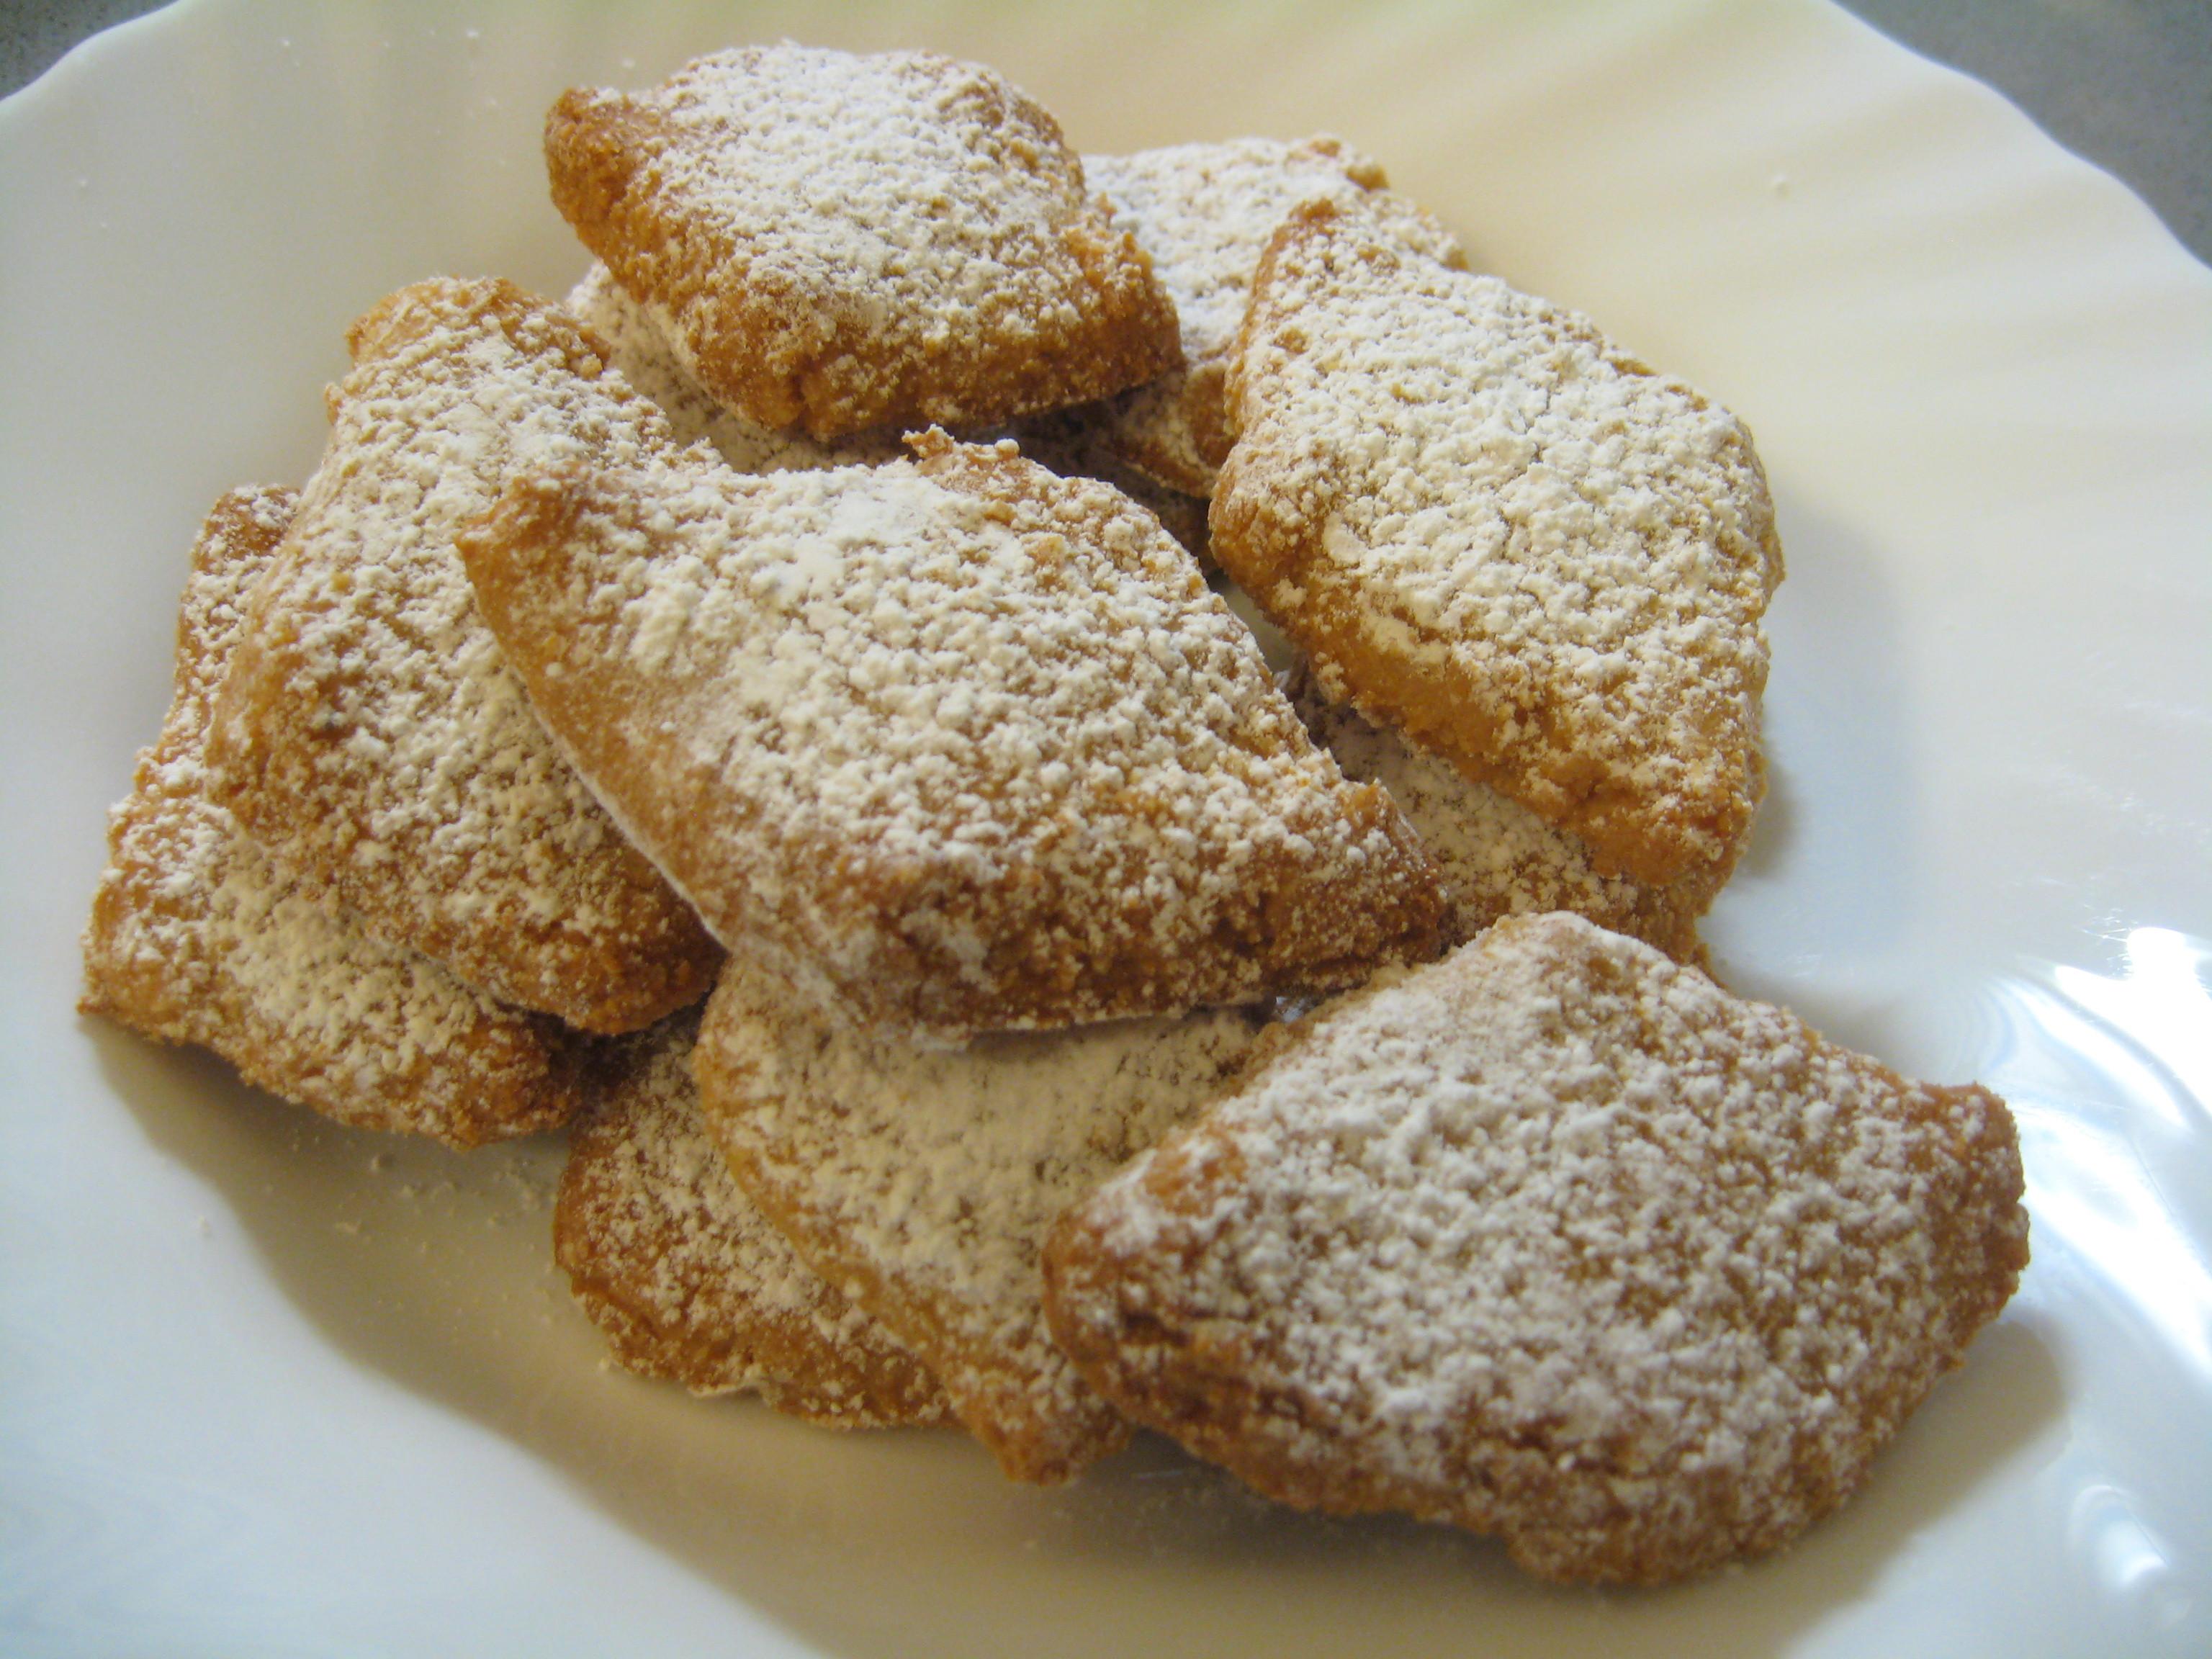 Italian Christmas Desserts Recipes  Ricciarelli Recipe Italian Christmas Treat BrowsingRome